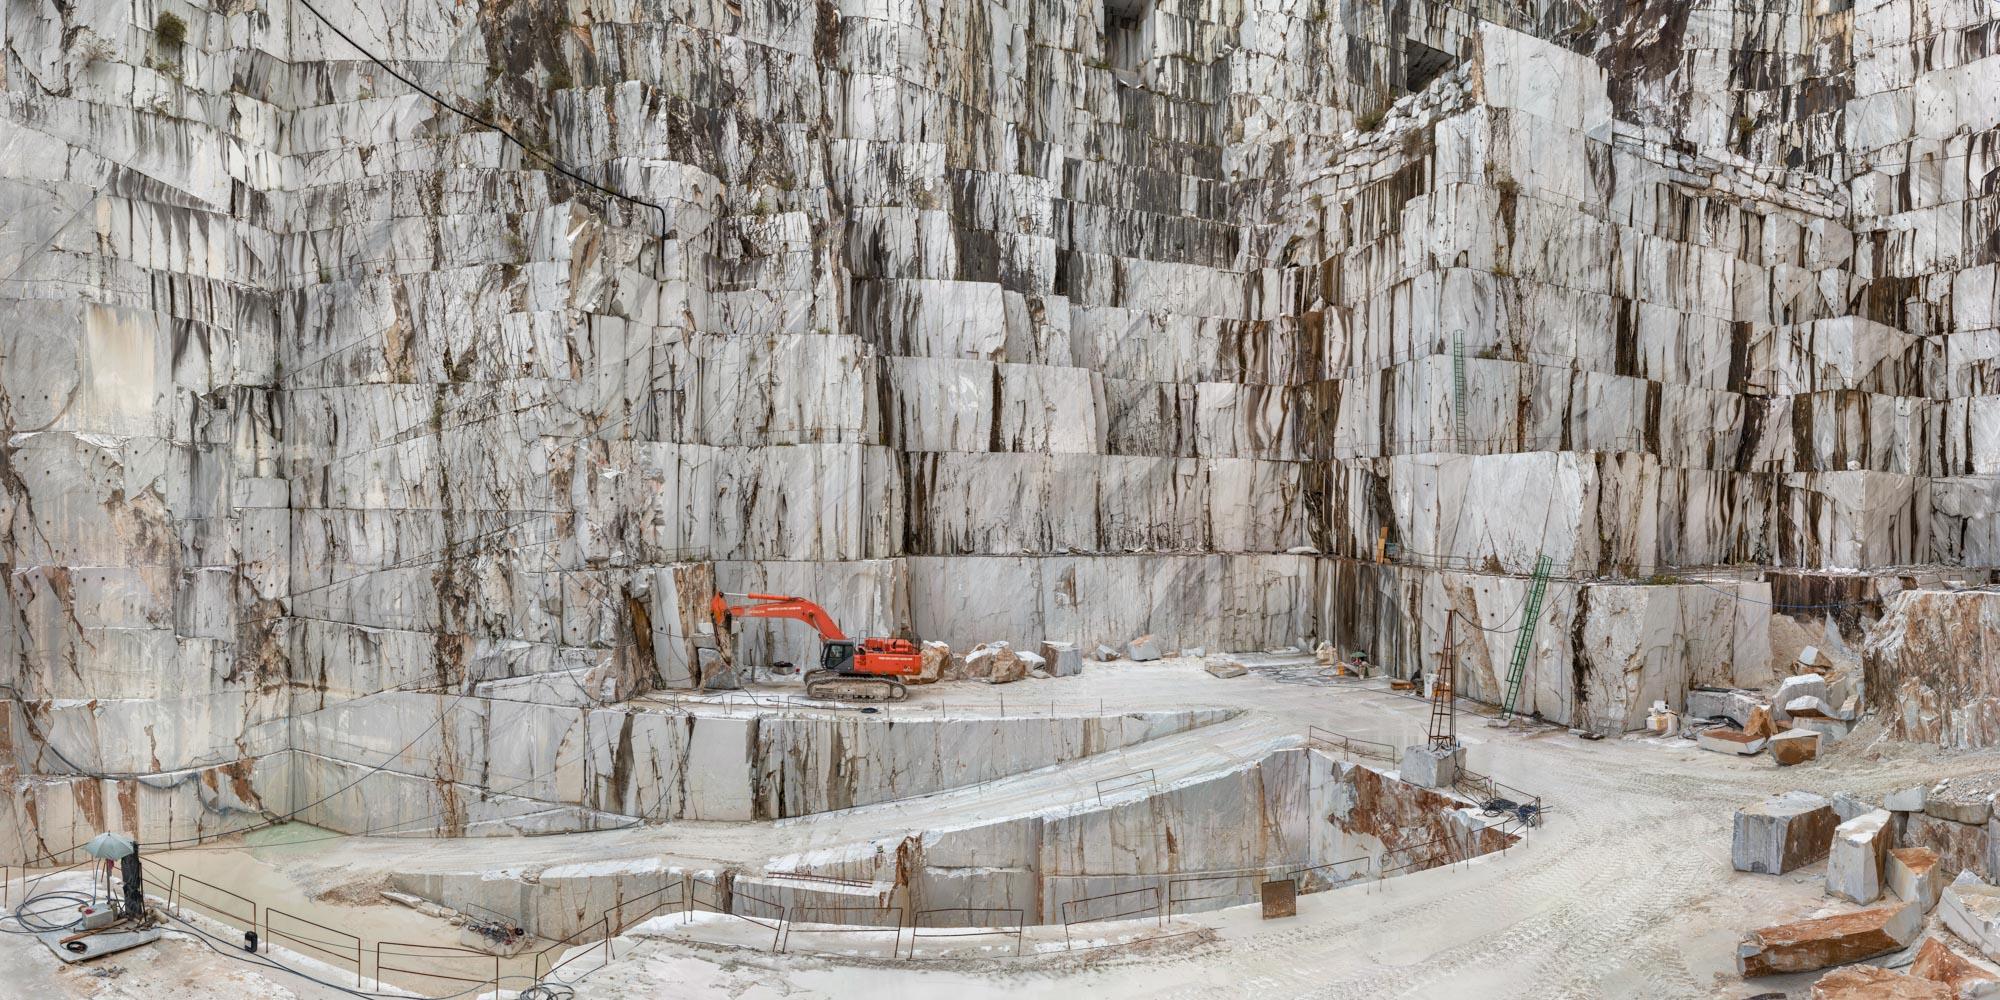 Edward Burtynsky, Carrara Marble Quarries, Cava di Canalgrande #2, Carrara, Italy, 2016 © Edward Burtynsky. Courtesy Admira Photography, Milano & Nicholas Metivier Gallery, Toronto